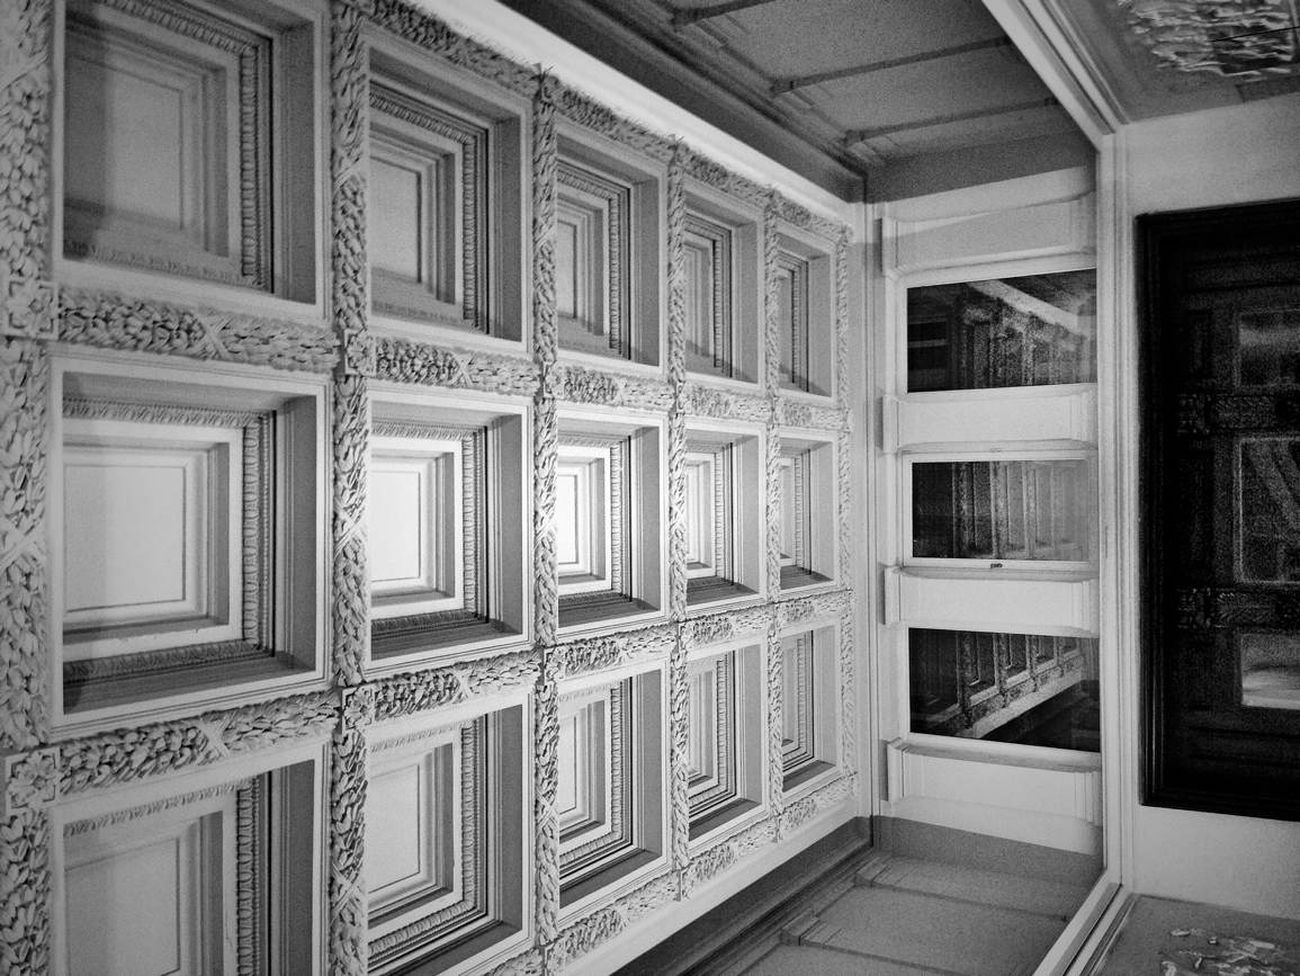 EyeEm Best Shots - Black + White Awesome Architecture EyeEm Best Shots Blackandwhite